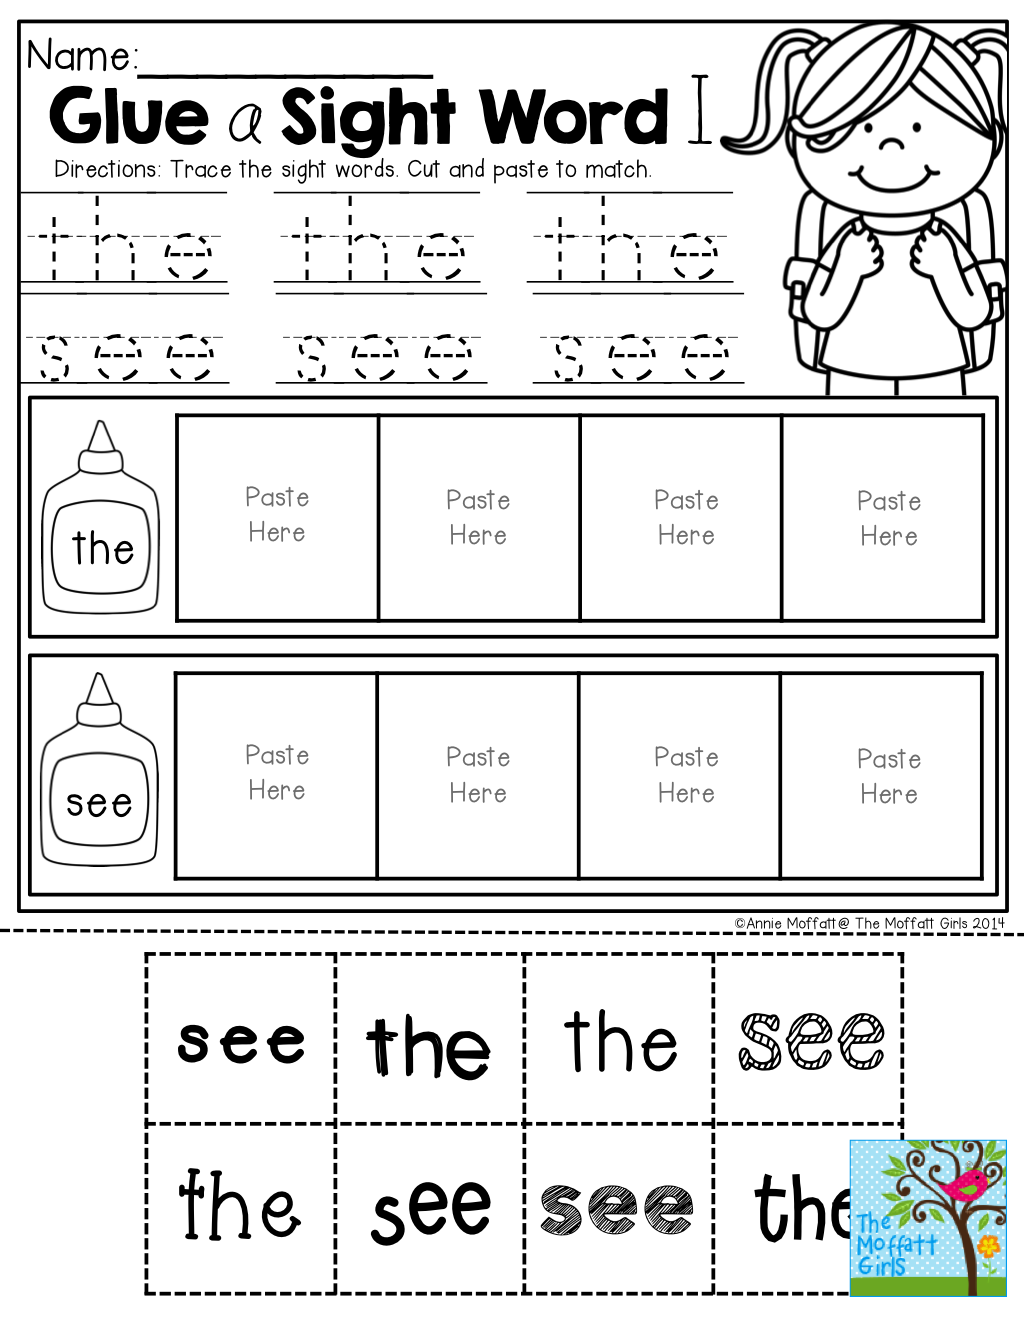 b165f976a46a1ea6fae85ca3c7bff822 - Kindergarten Sight Word Activities